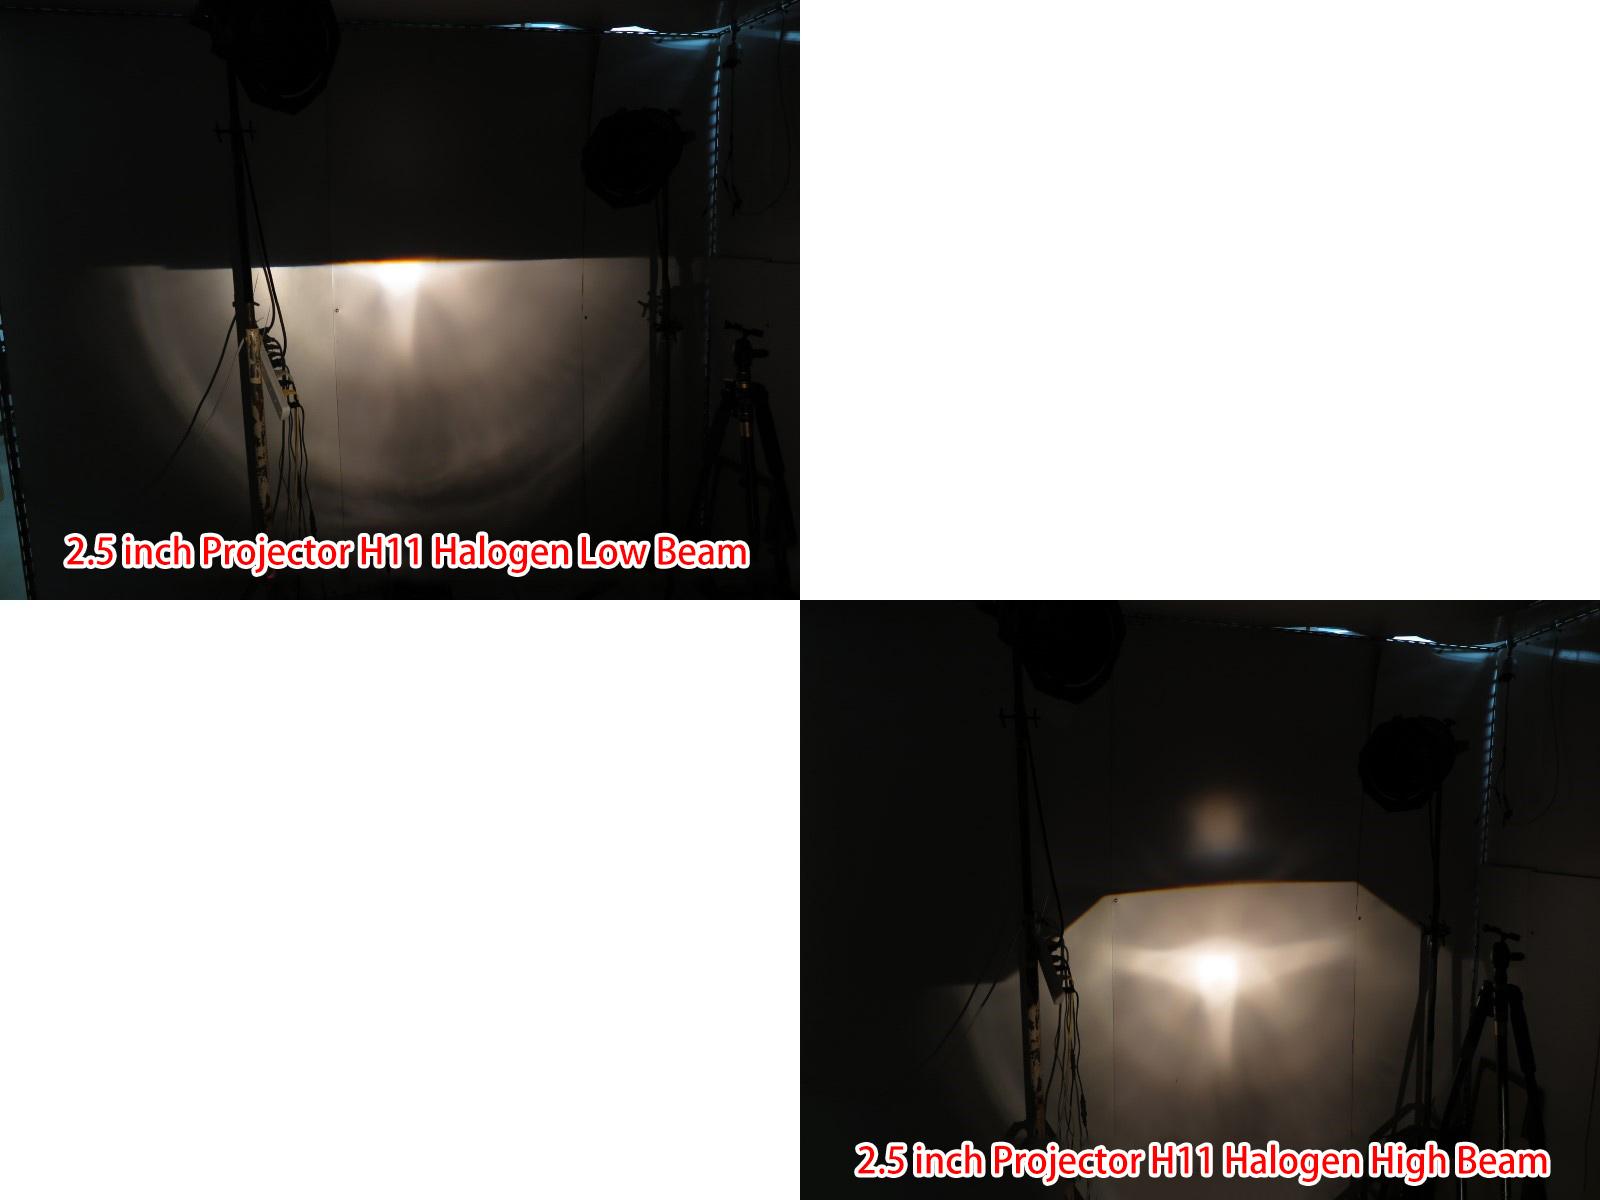 thumbnail 7 - Mazda 6 GH1 MK2 10-11 Facelift 4D/5D Projector Dual Beam Fog Light BK for MAZDA